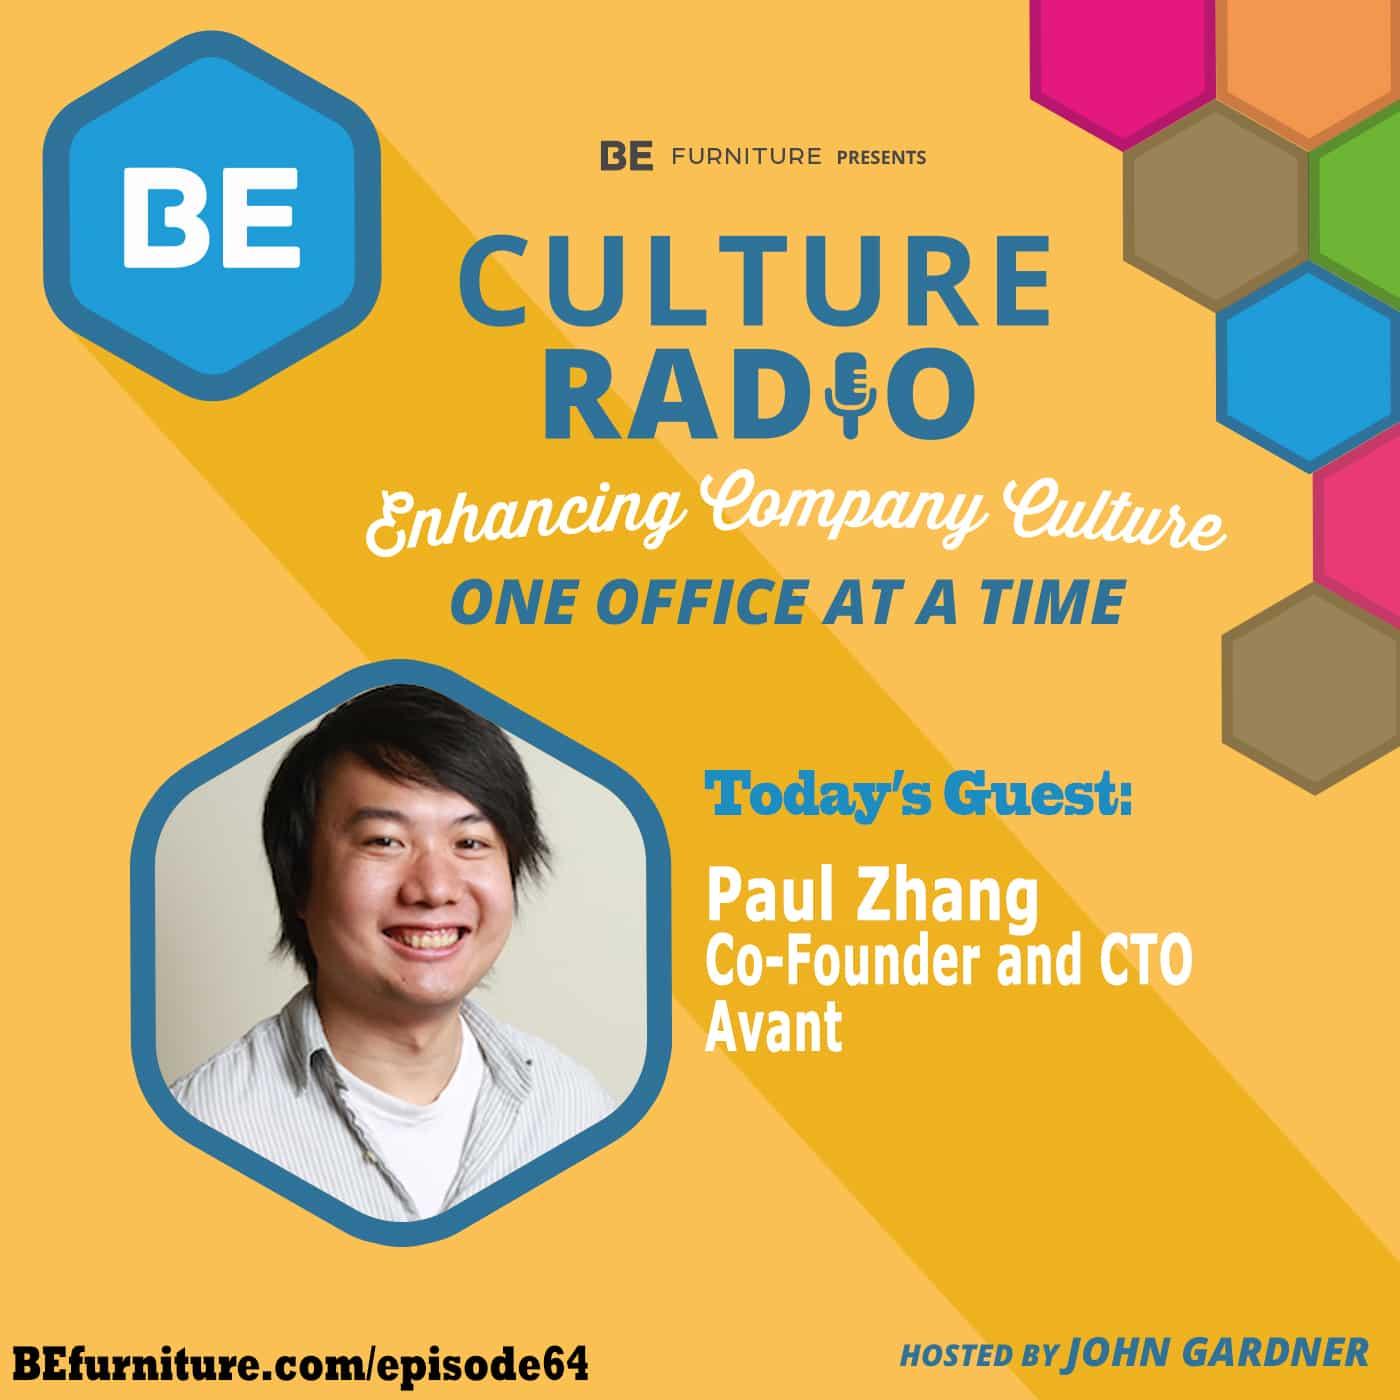 Paul Zhang, CTO - Avant